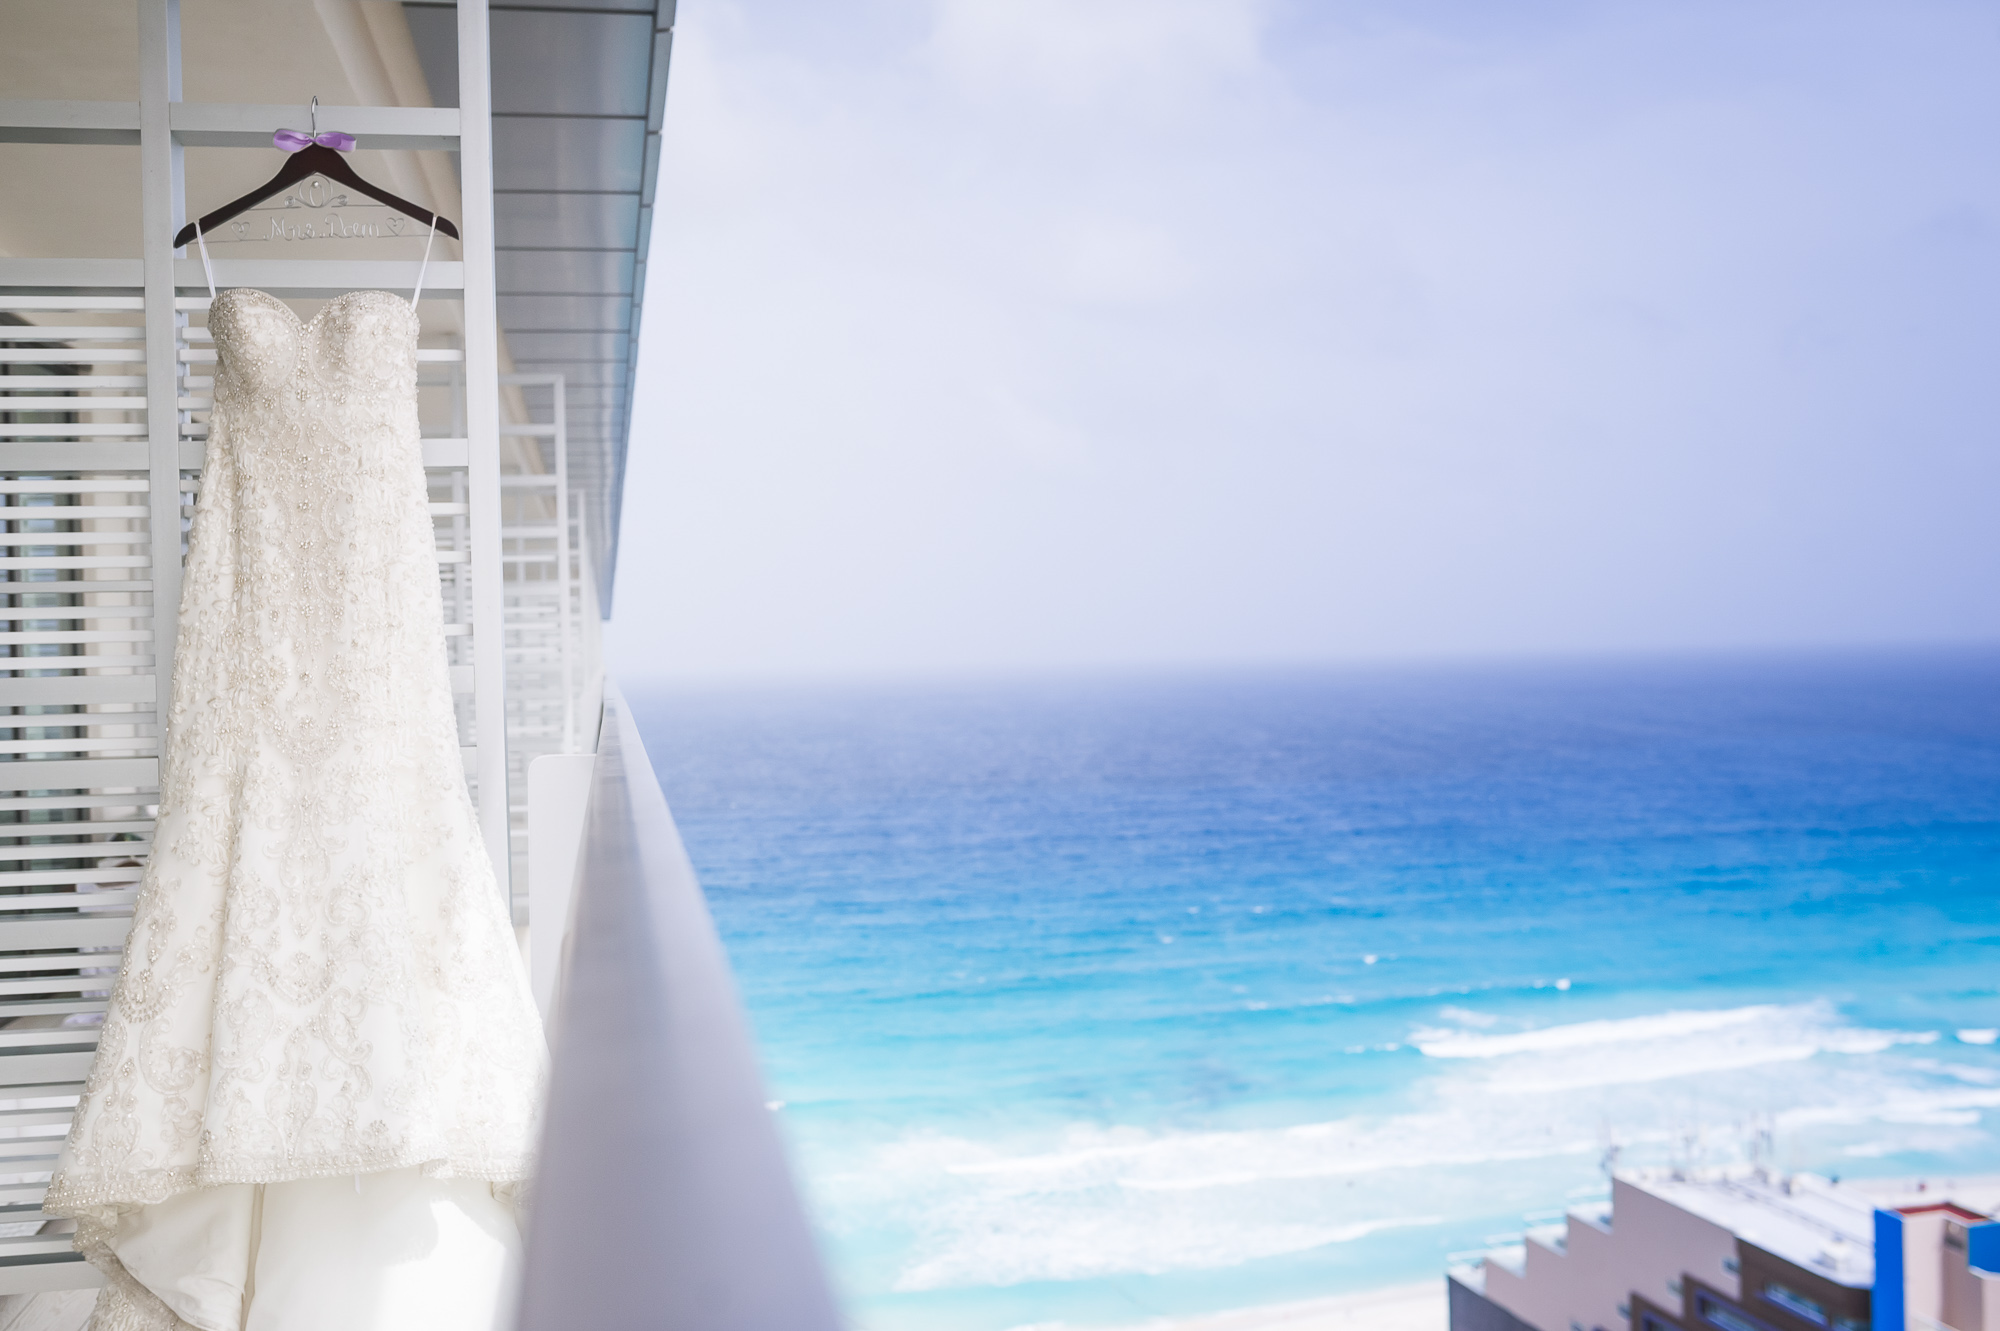 3-David Loi Studios - Cancun - Mexico - Destination Wedding-25436.jpg